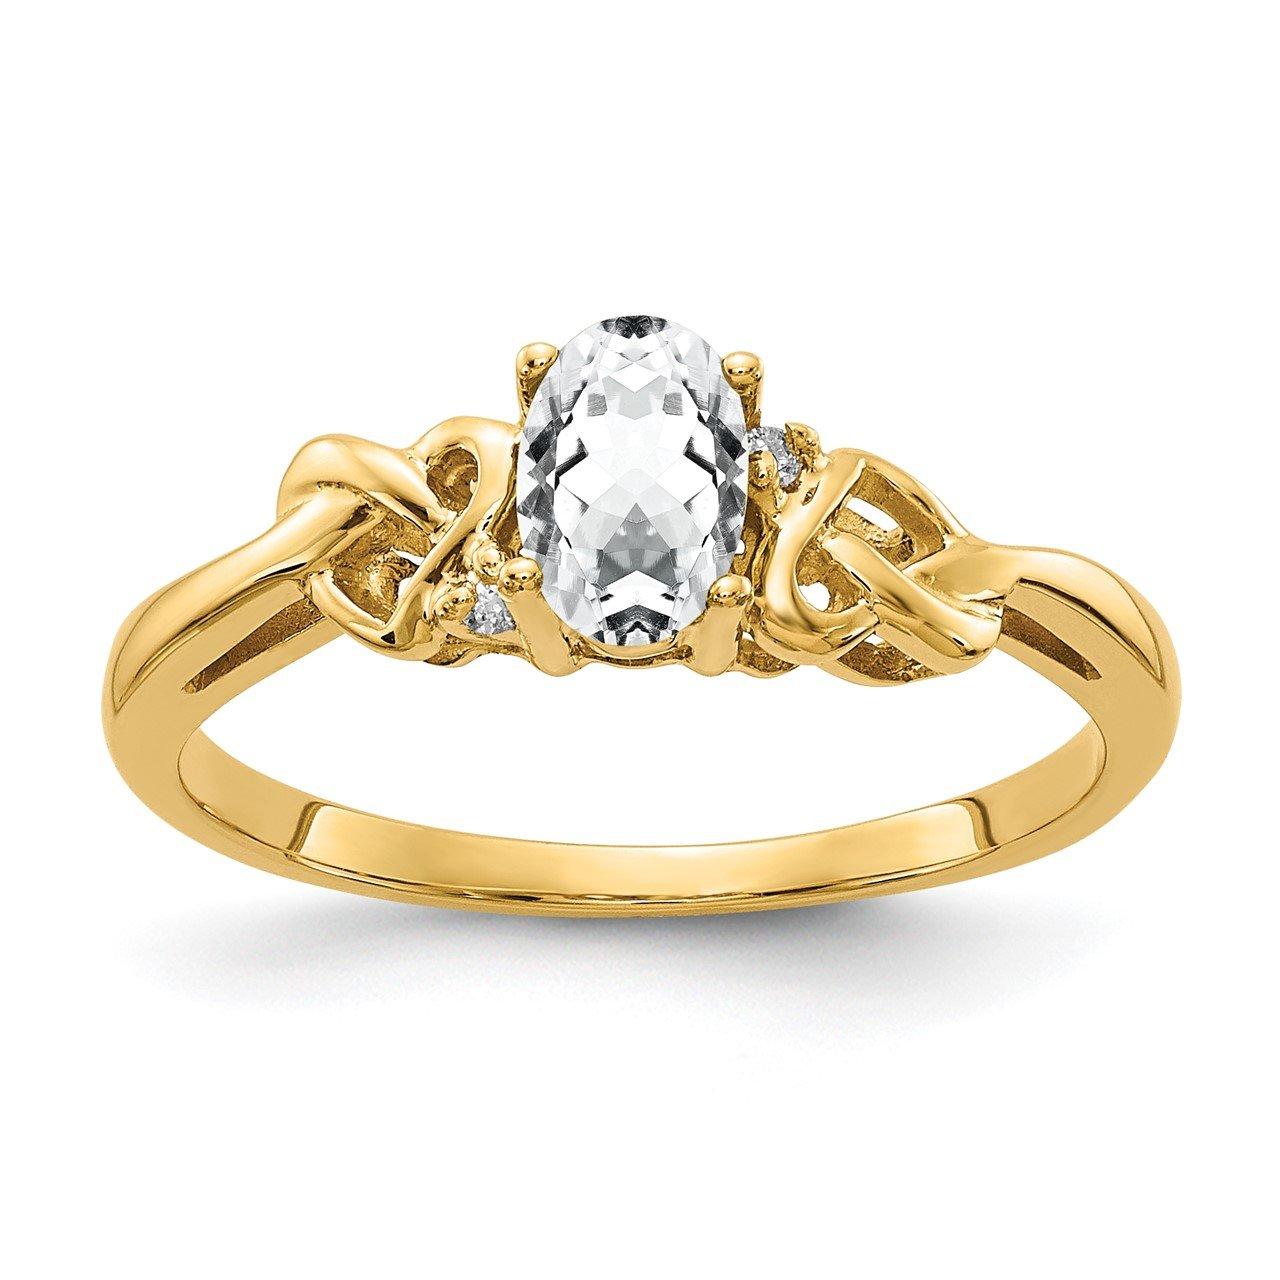 14k 6x4mm Oval Cubic Zirconia AA Diamond ring